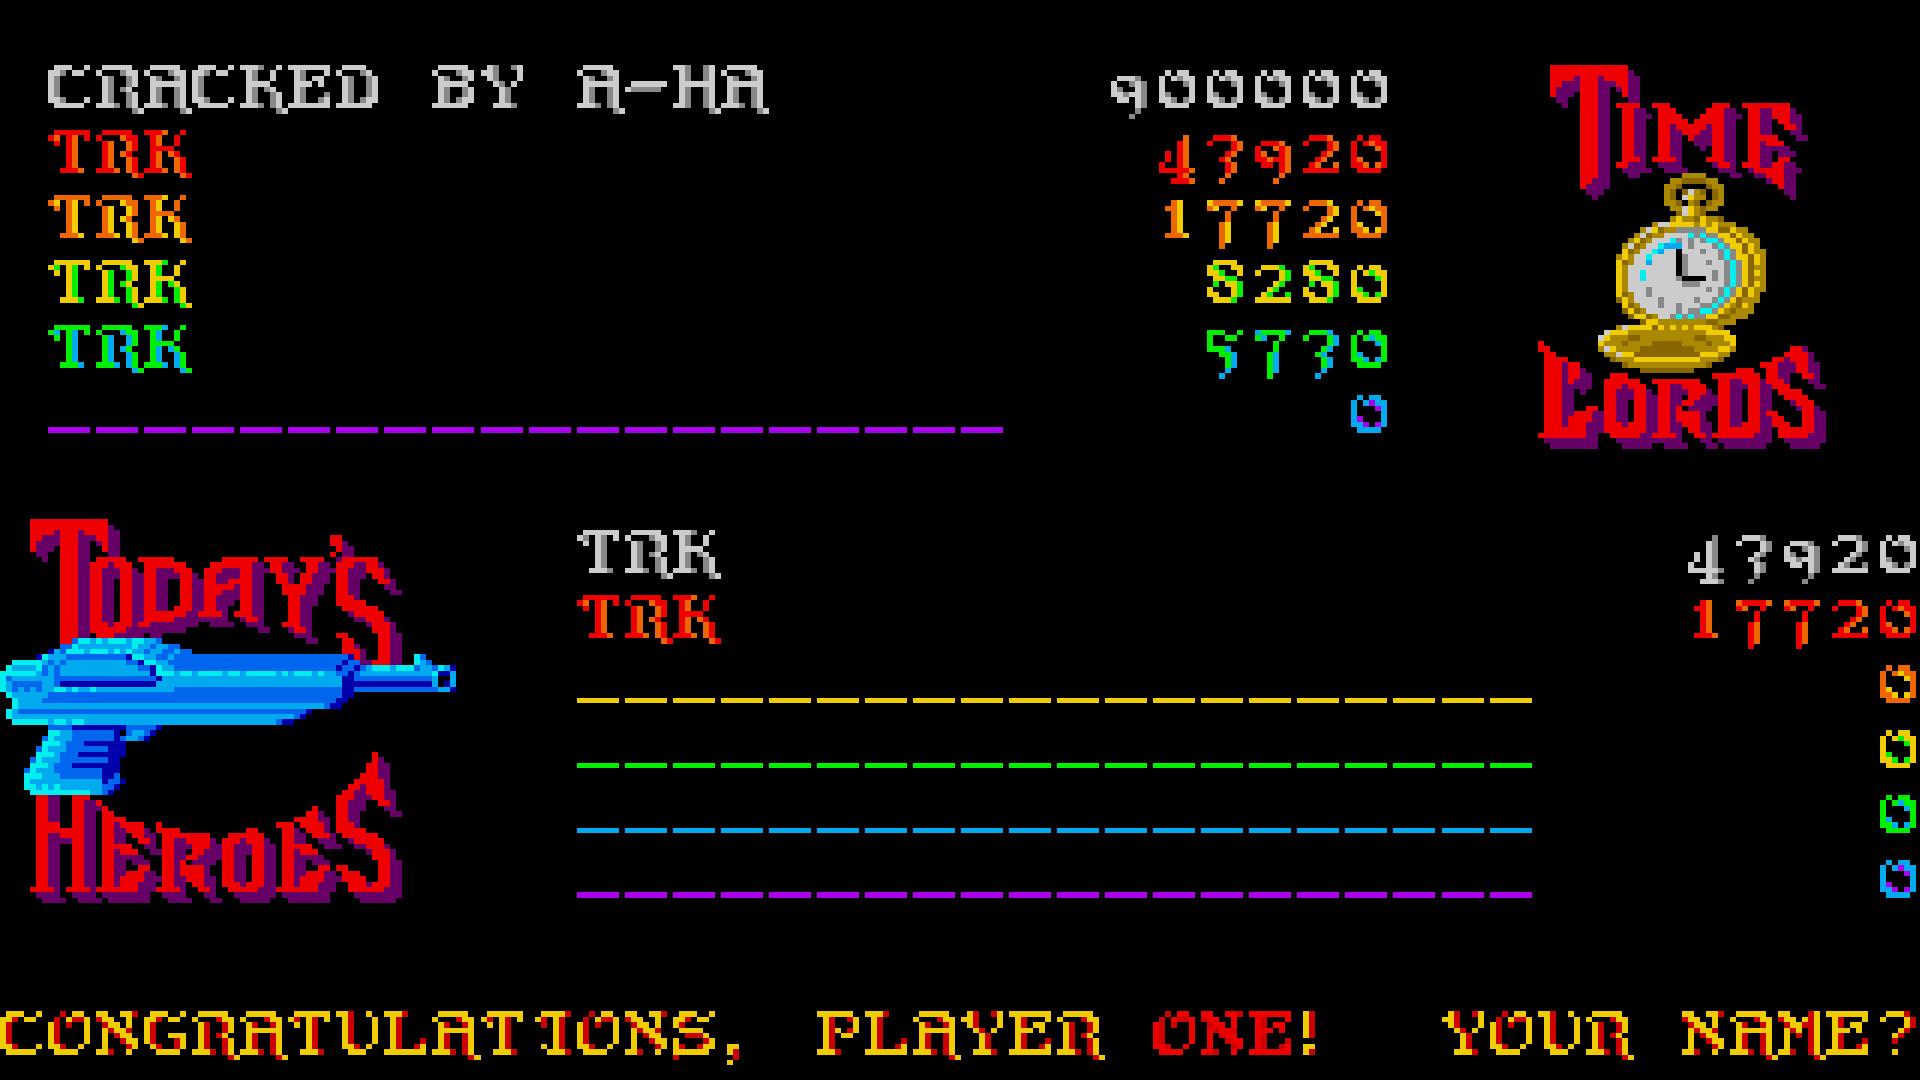 Time Bandit 43,920 points